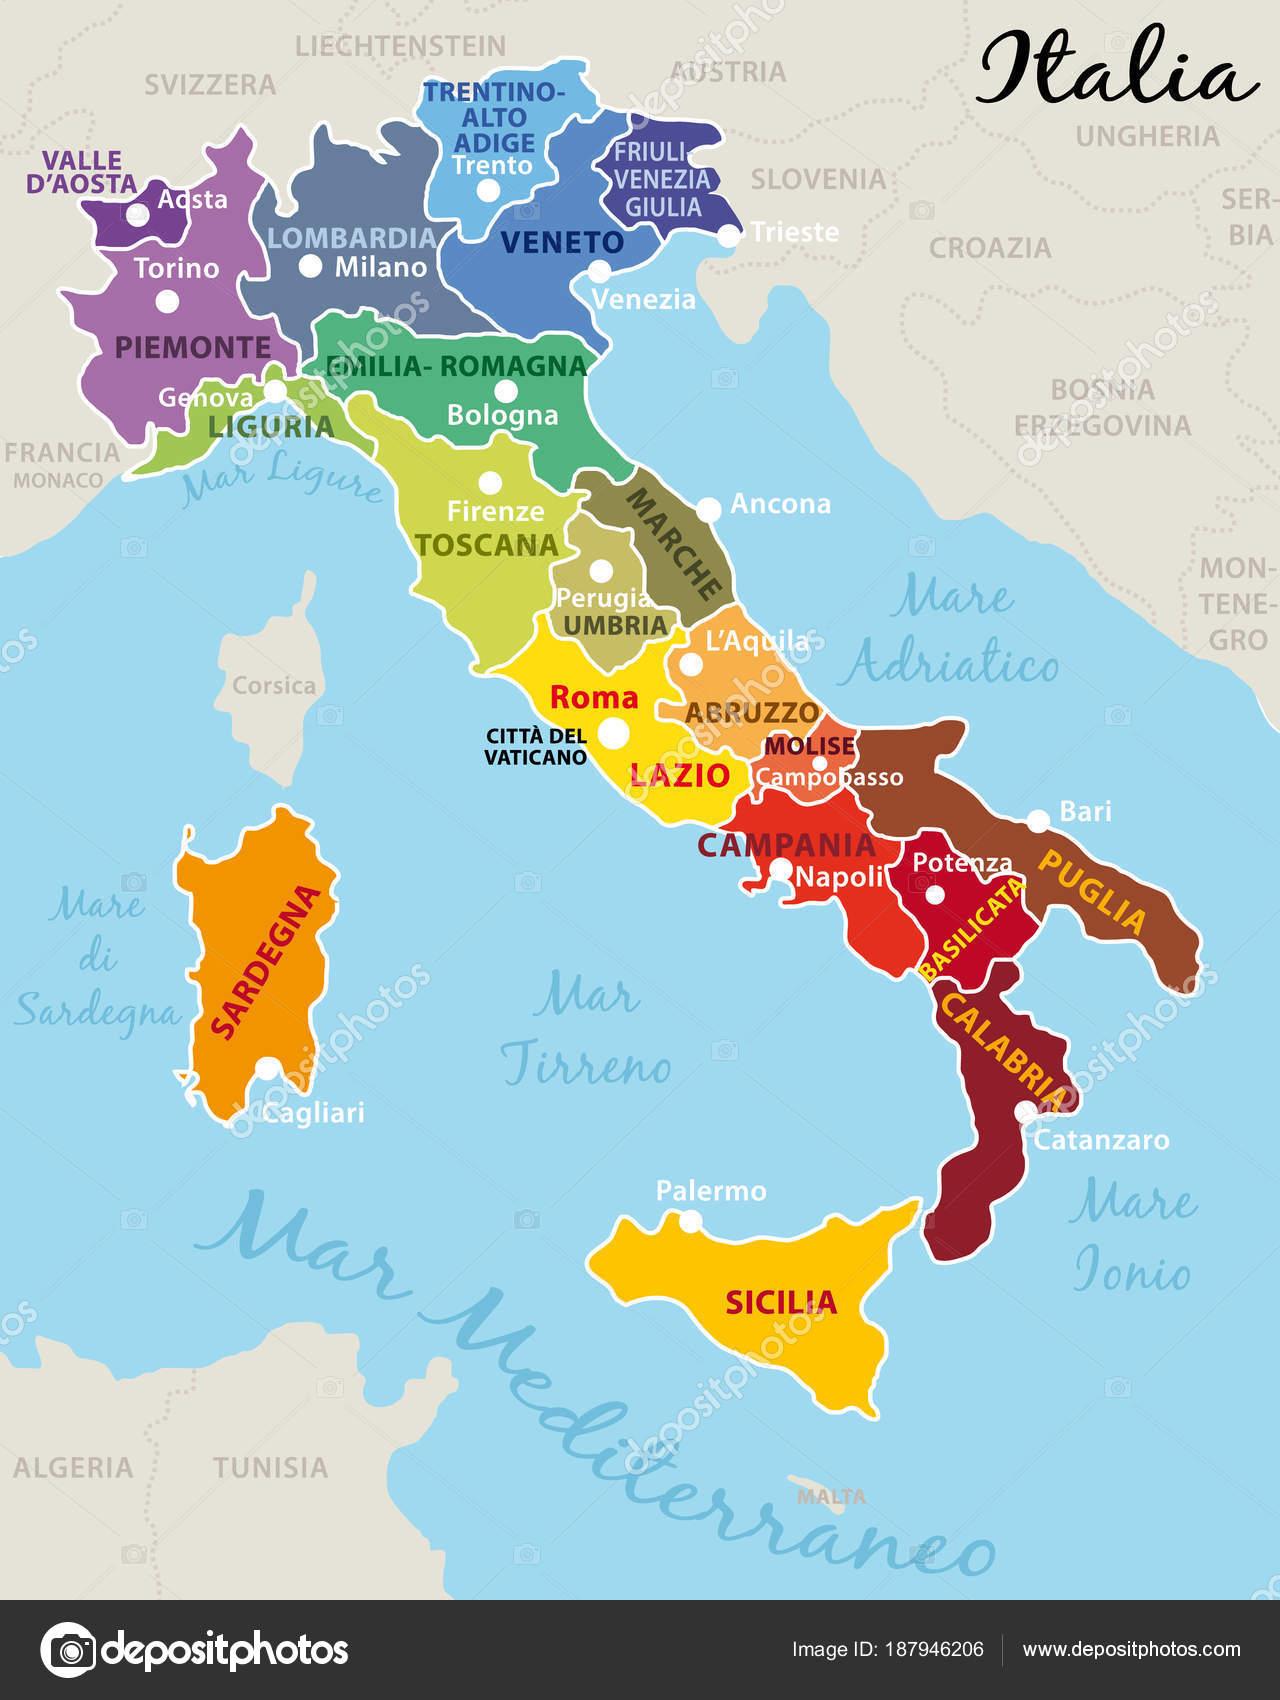 Beautiful colorful map italy italian regions capitals important beautiful and colorful map of italy with italian regions capitals and important cities vector illustration ii vector by albachiaraa gumiabroncs Choice Image